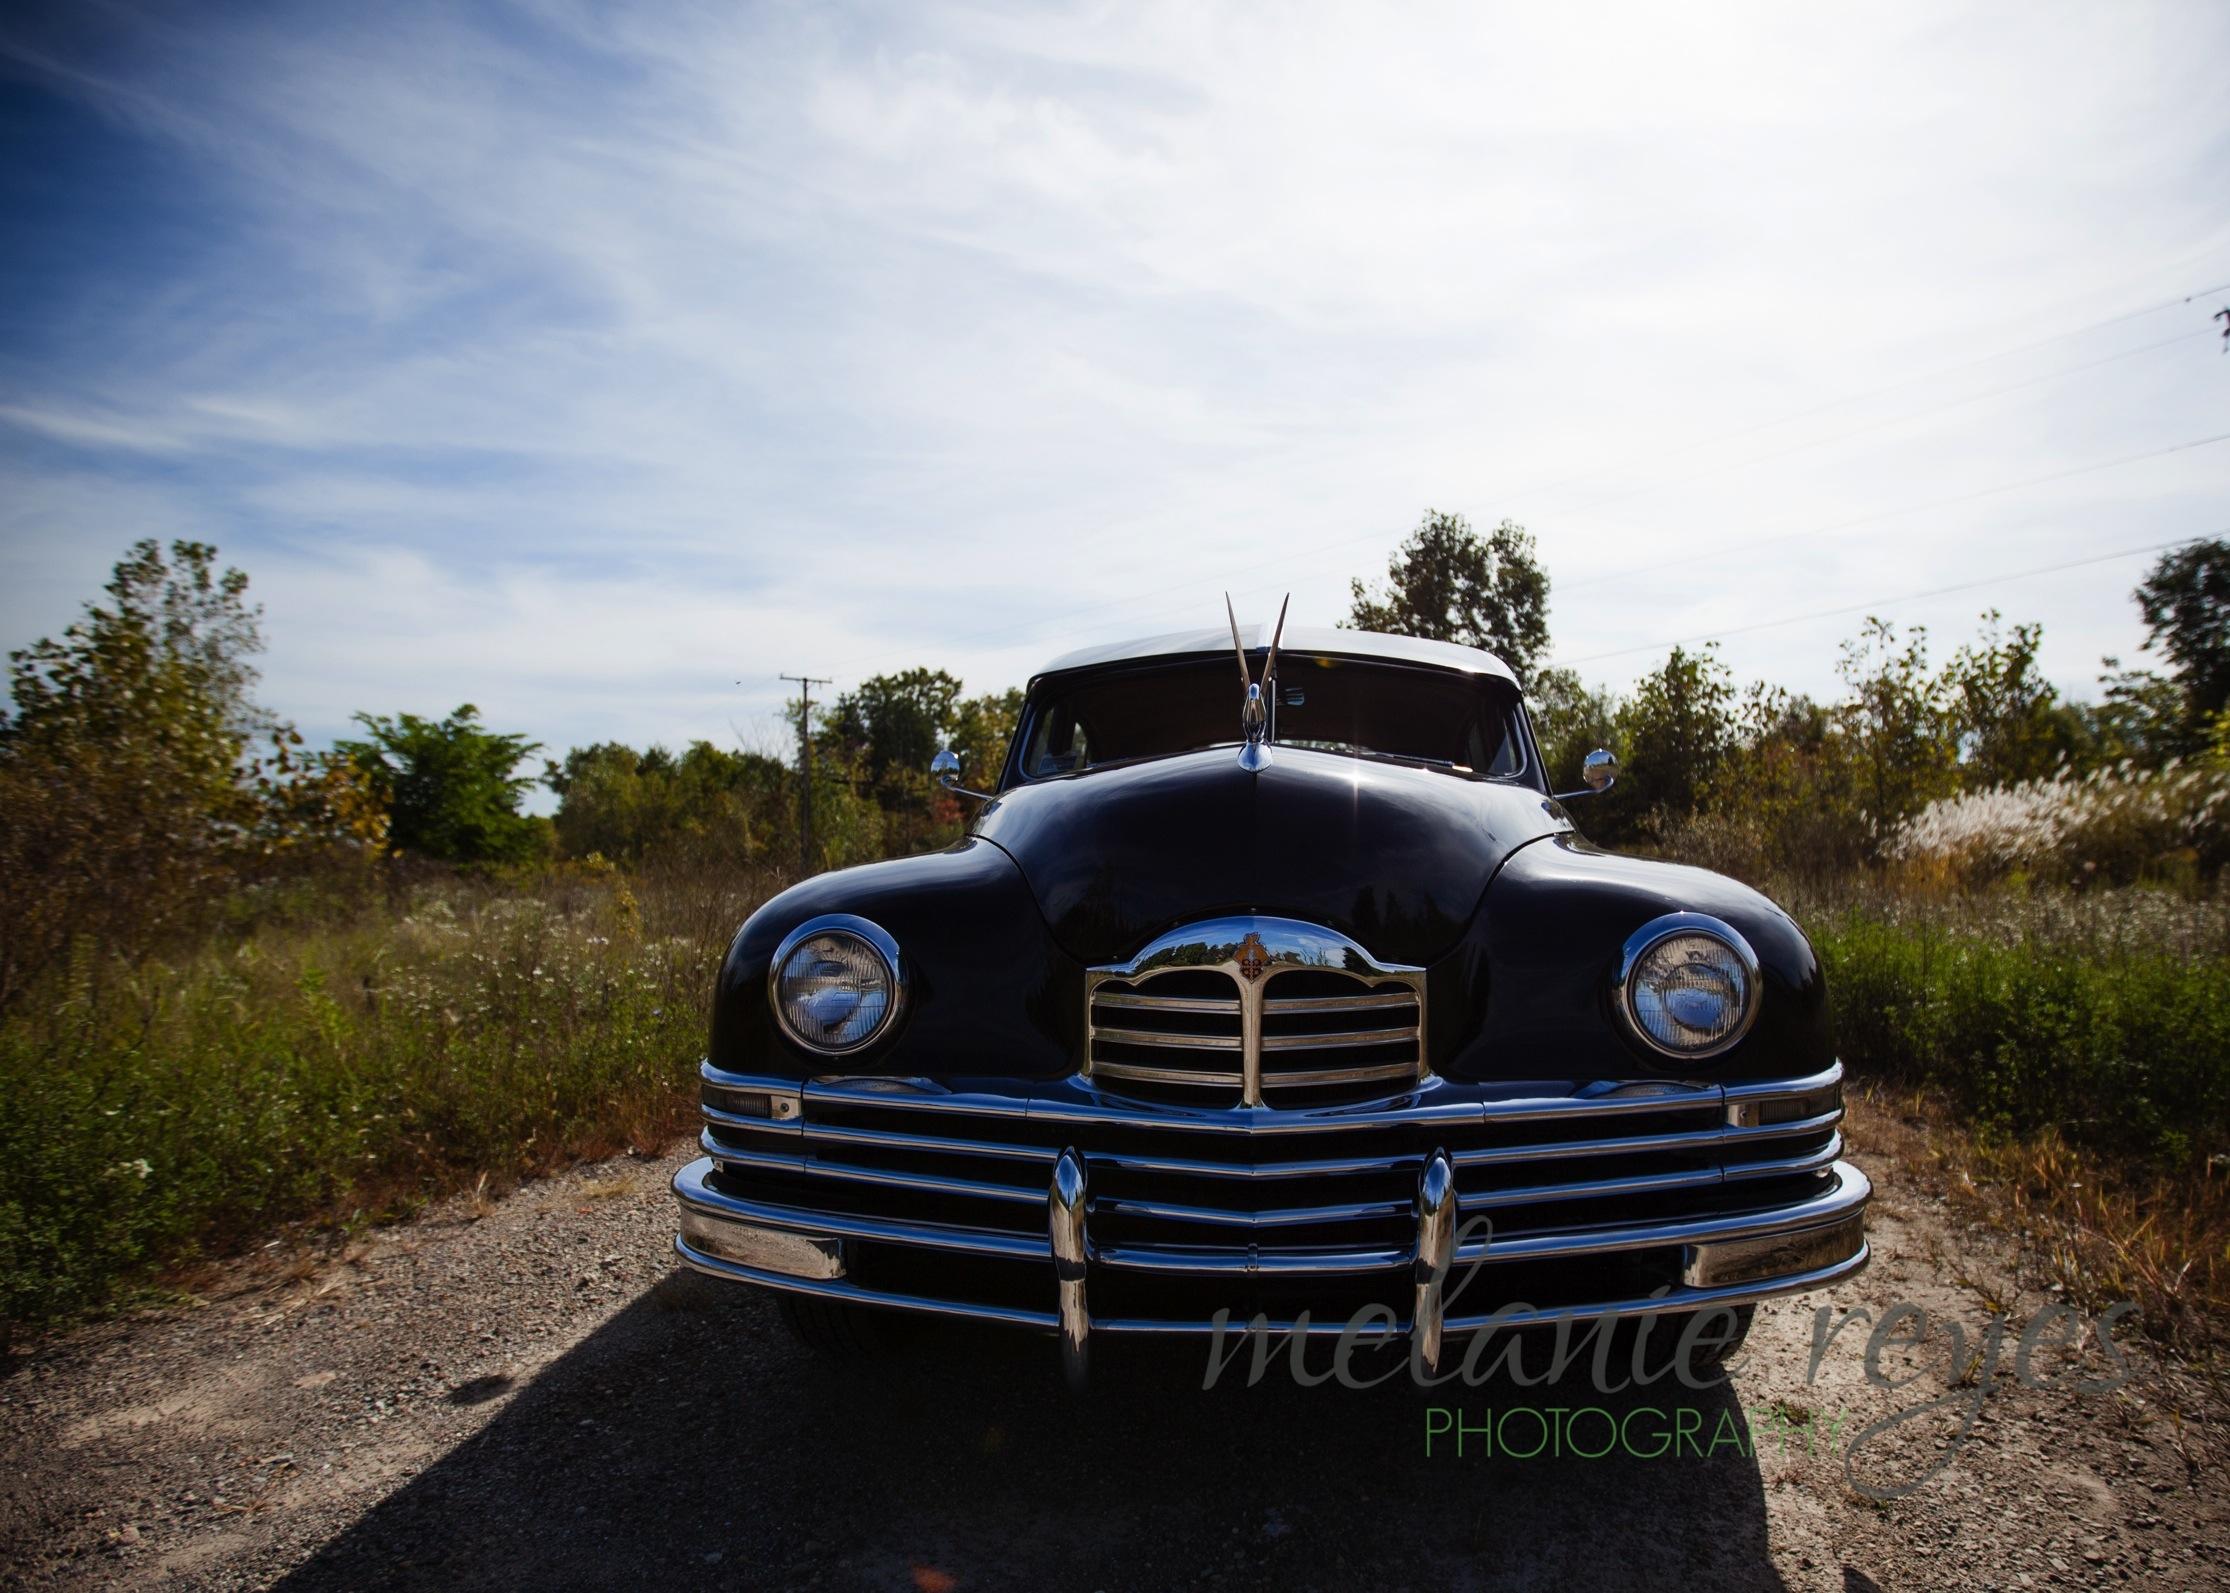 melanie_reyes_photography__motor_city_vintage_rentals_089